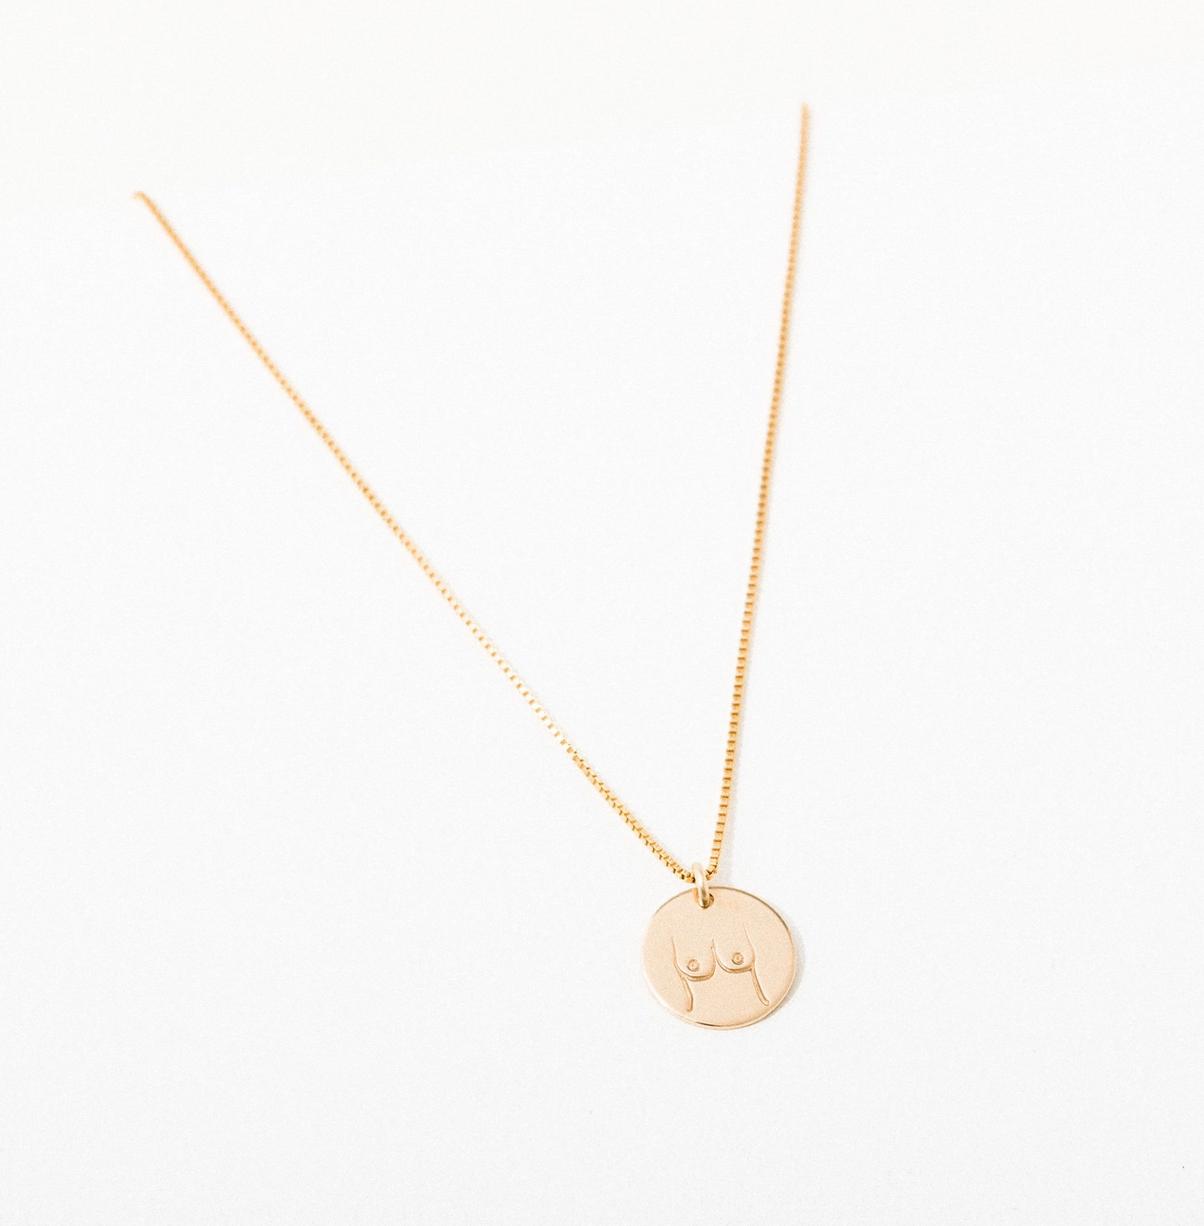 Larissa Loden Boobies Pendant Necklace-Gold Filled